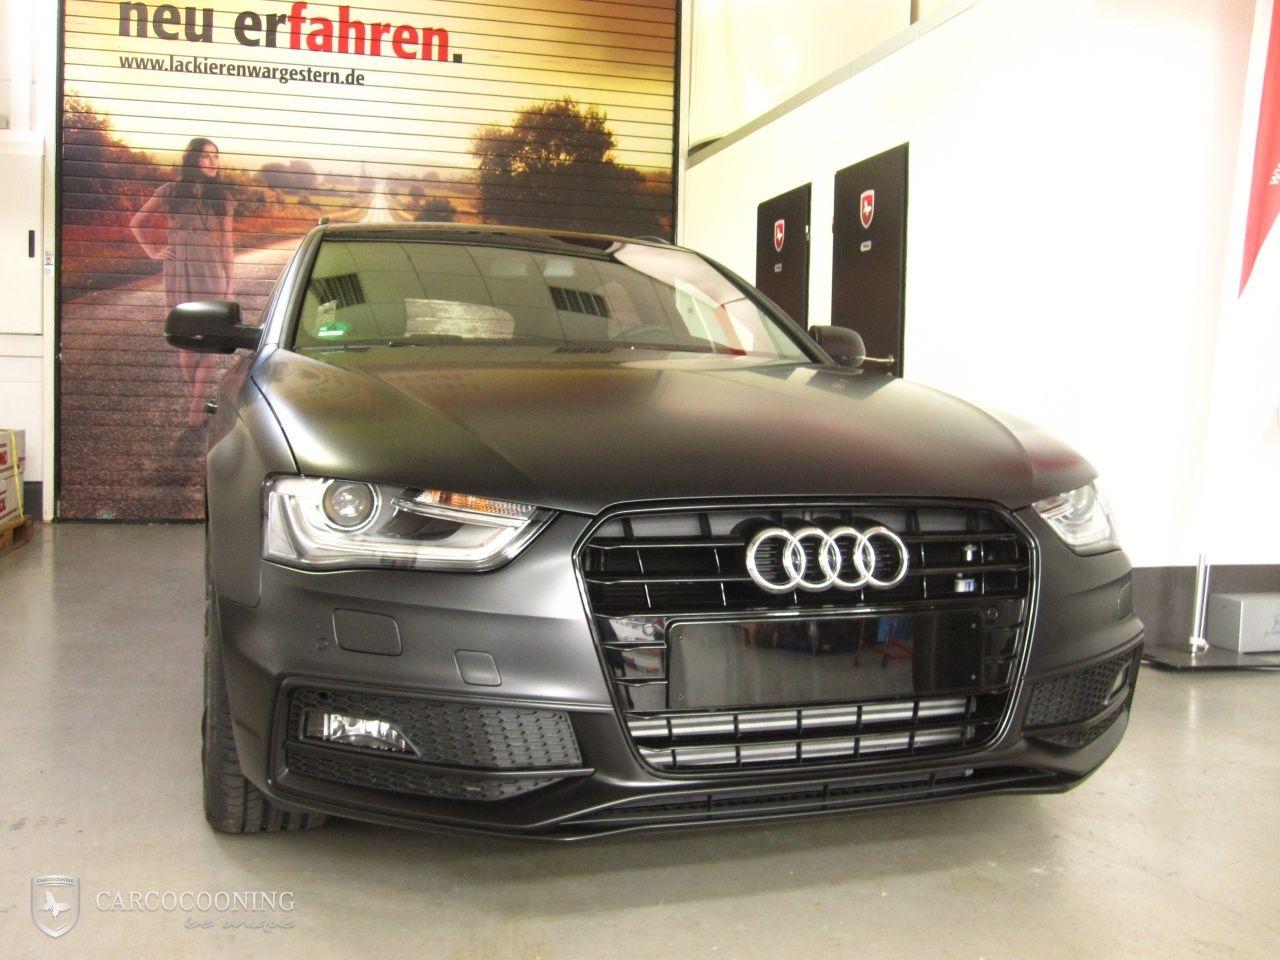 Audi A4 Bilder Topseller Allstars Car Cocooning Audi A4 Audi Folierung